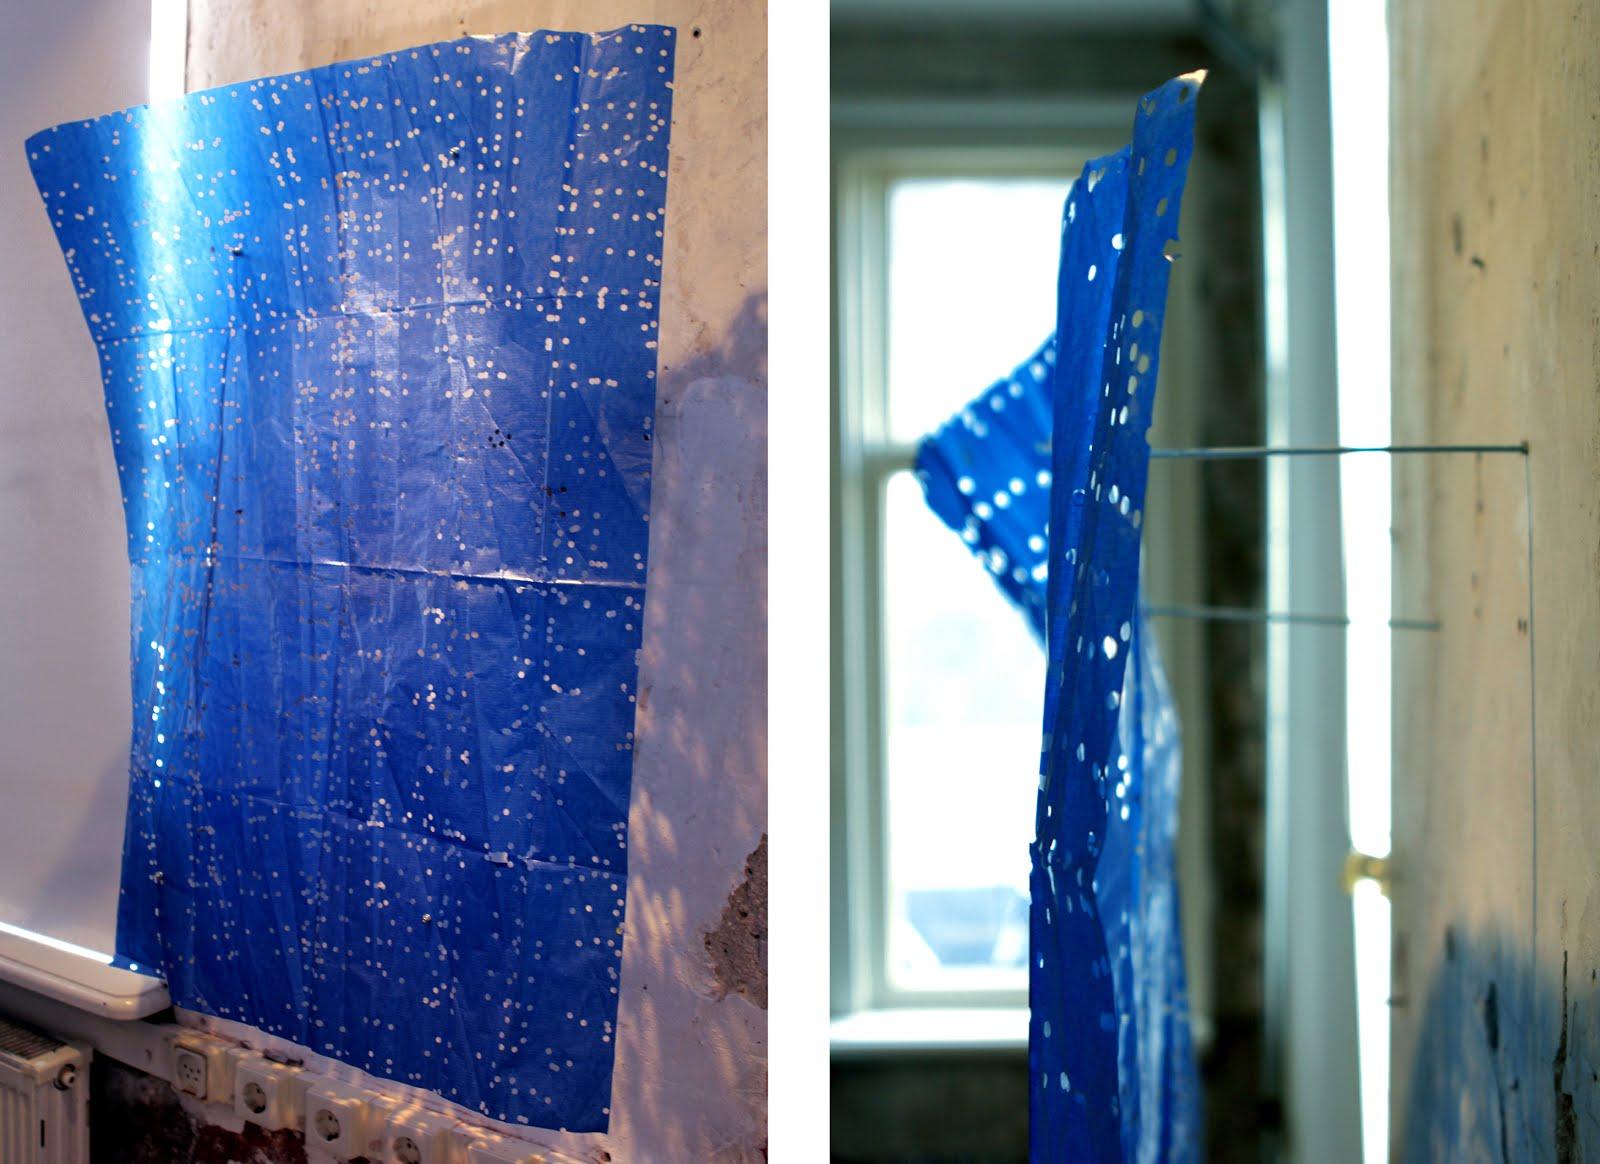 A Piece of Blue Velvet Hanging